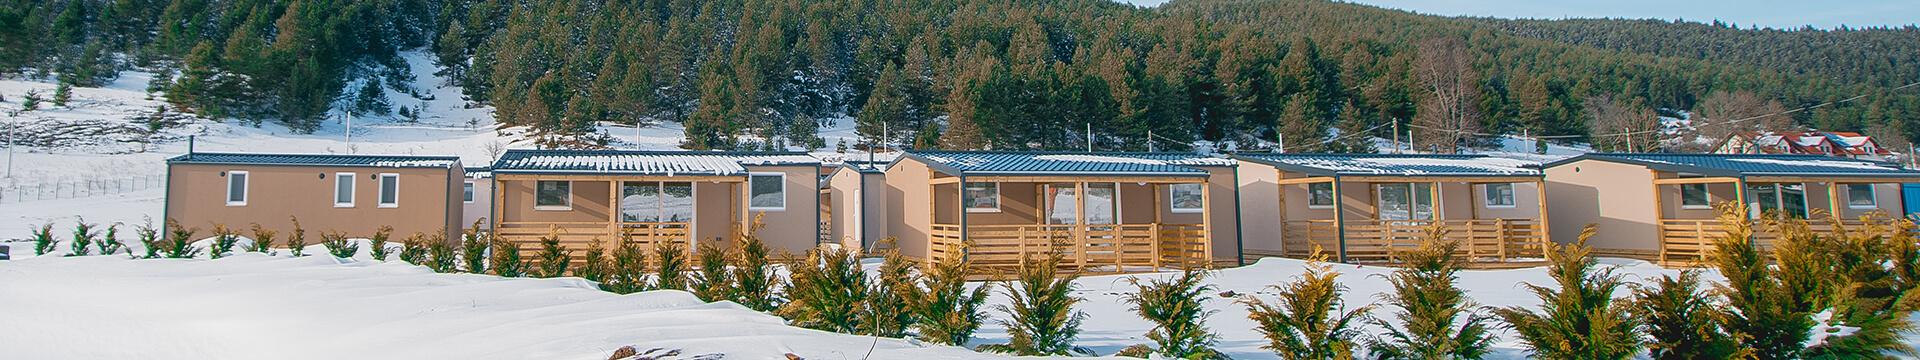 Upoznajte novi kamp Big Bear Plitvice Camping Resort i doživite iskonski povratak prirodi